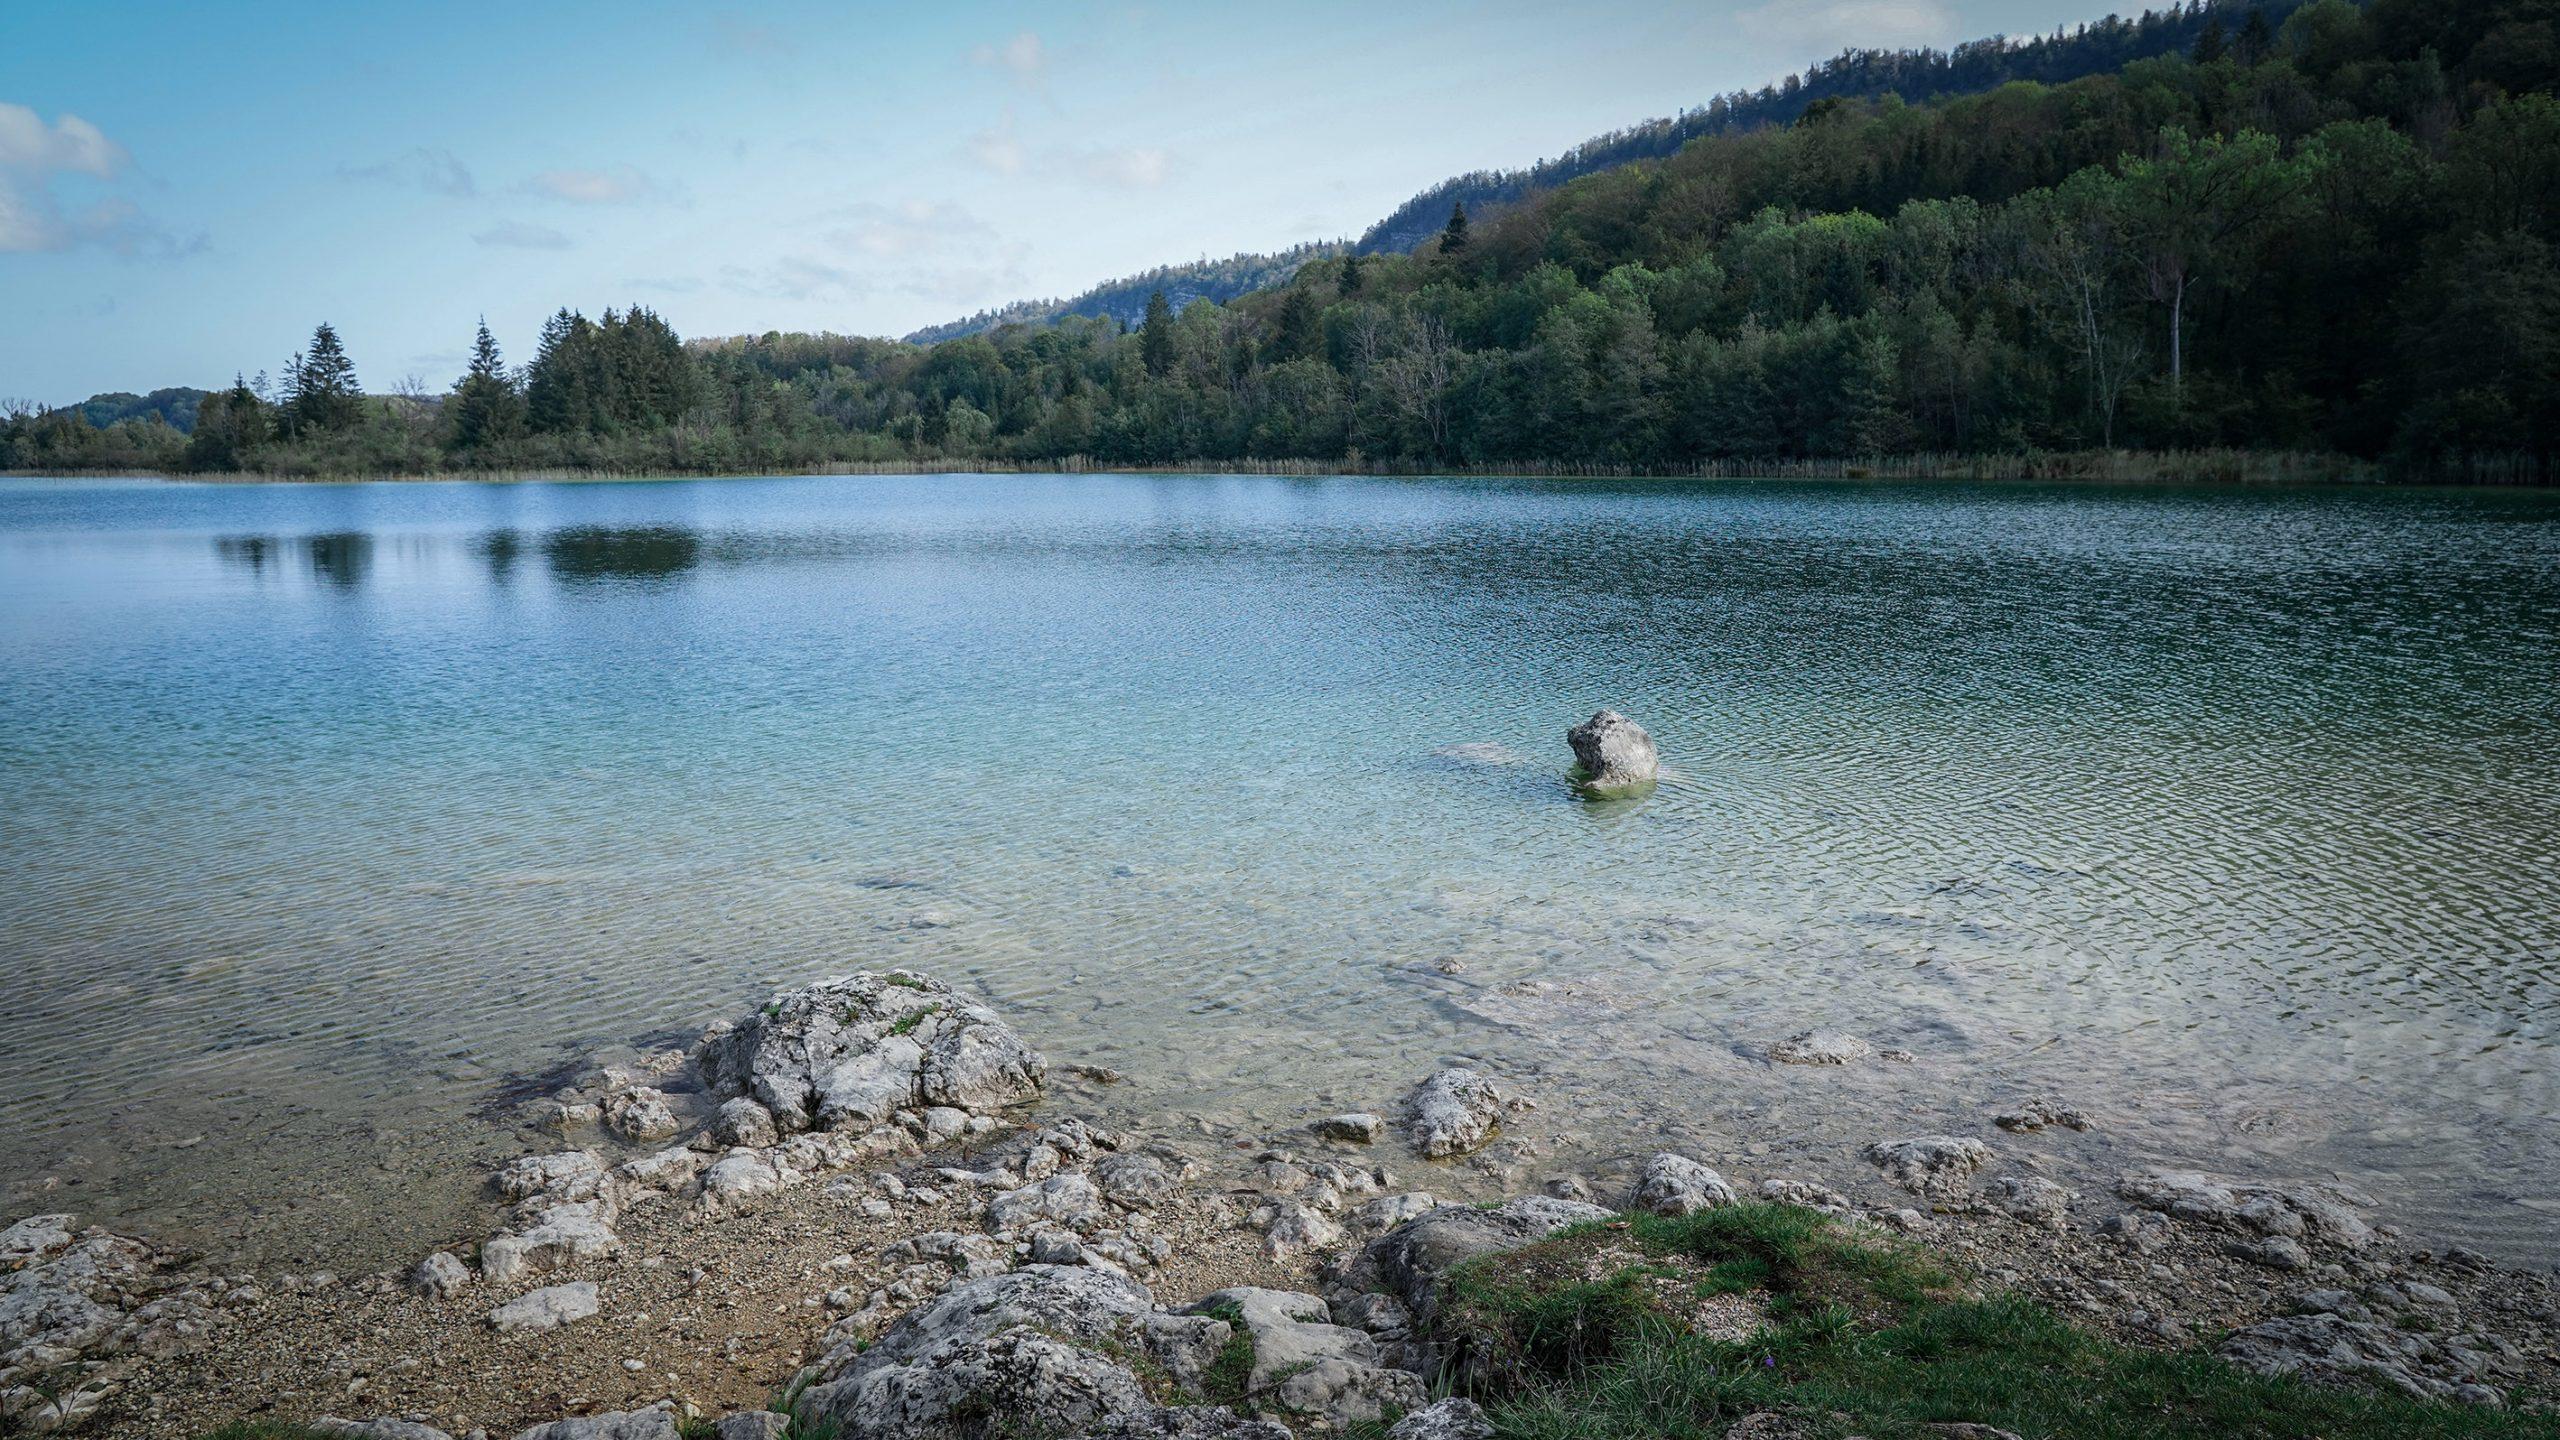 Lac Ilay Jura eau translucide bleu vert  sapins ciel bleu soleil